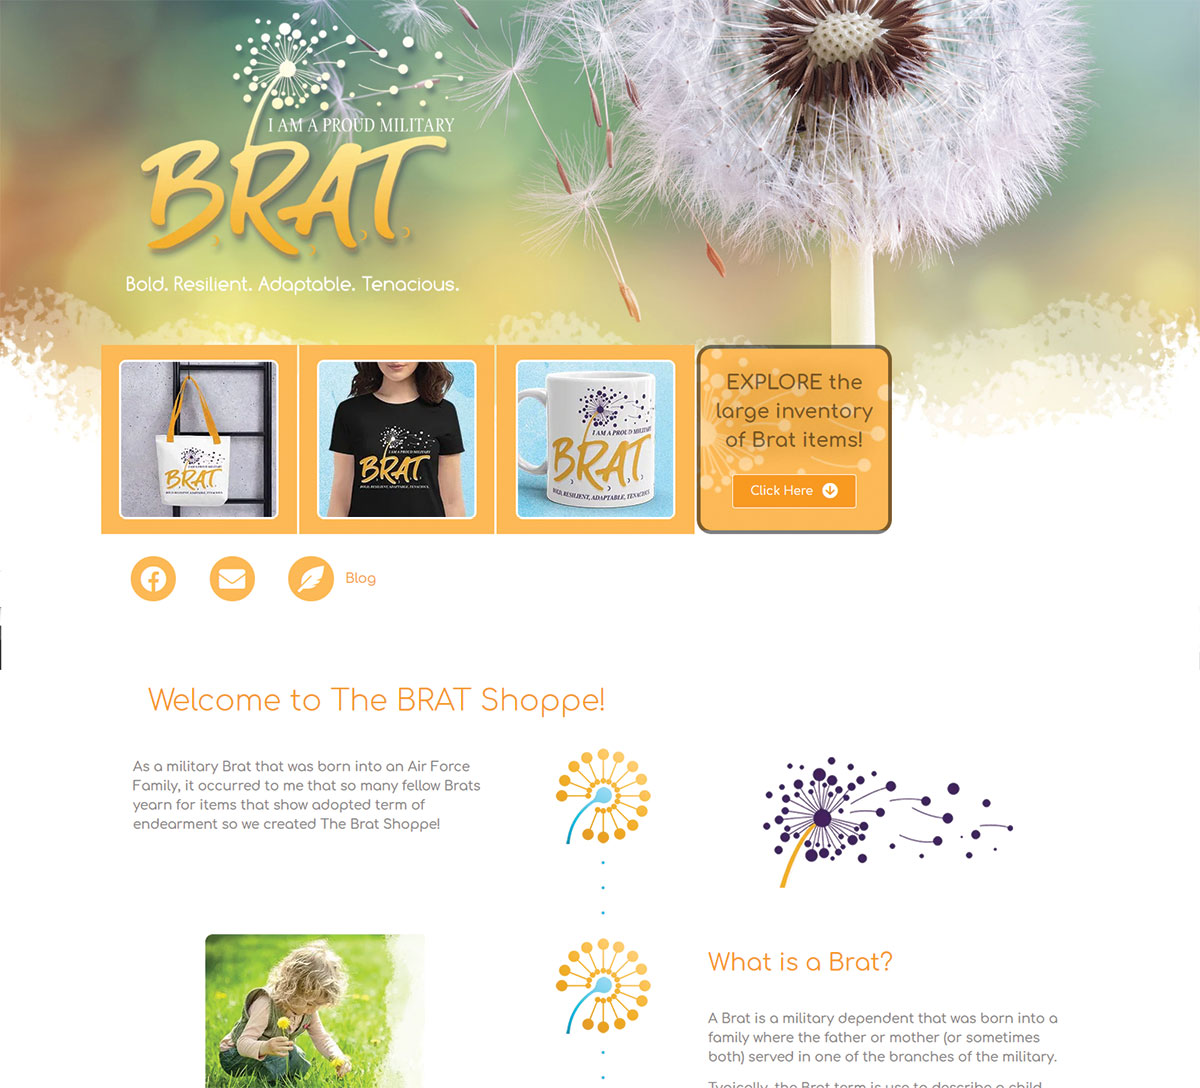 The Brat Shoppe Website Design & Marketing